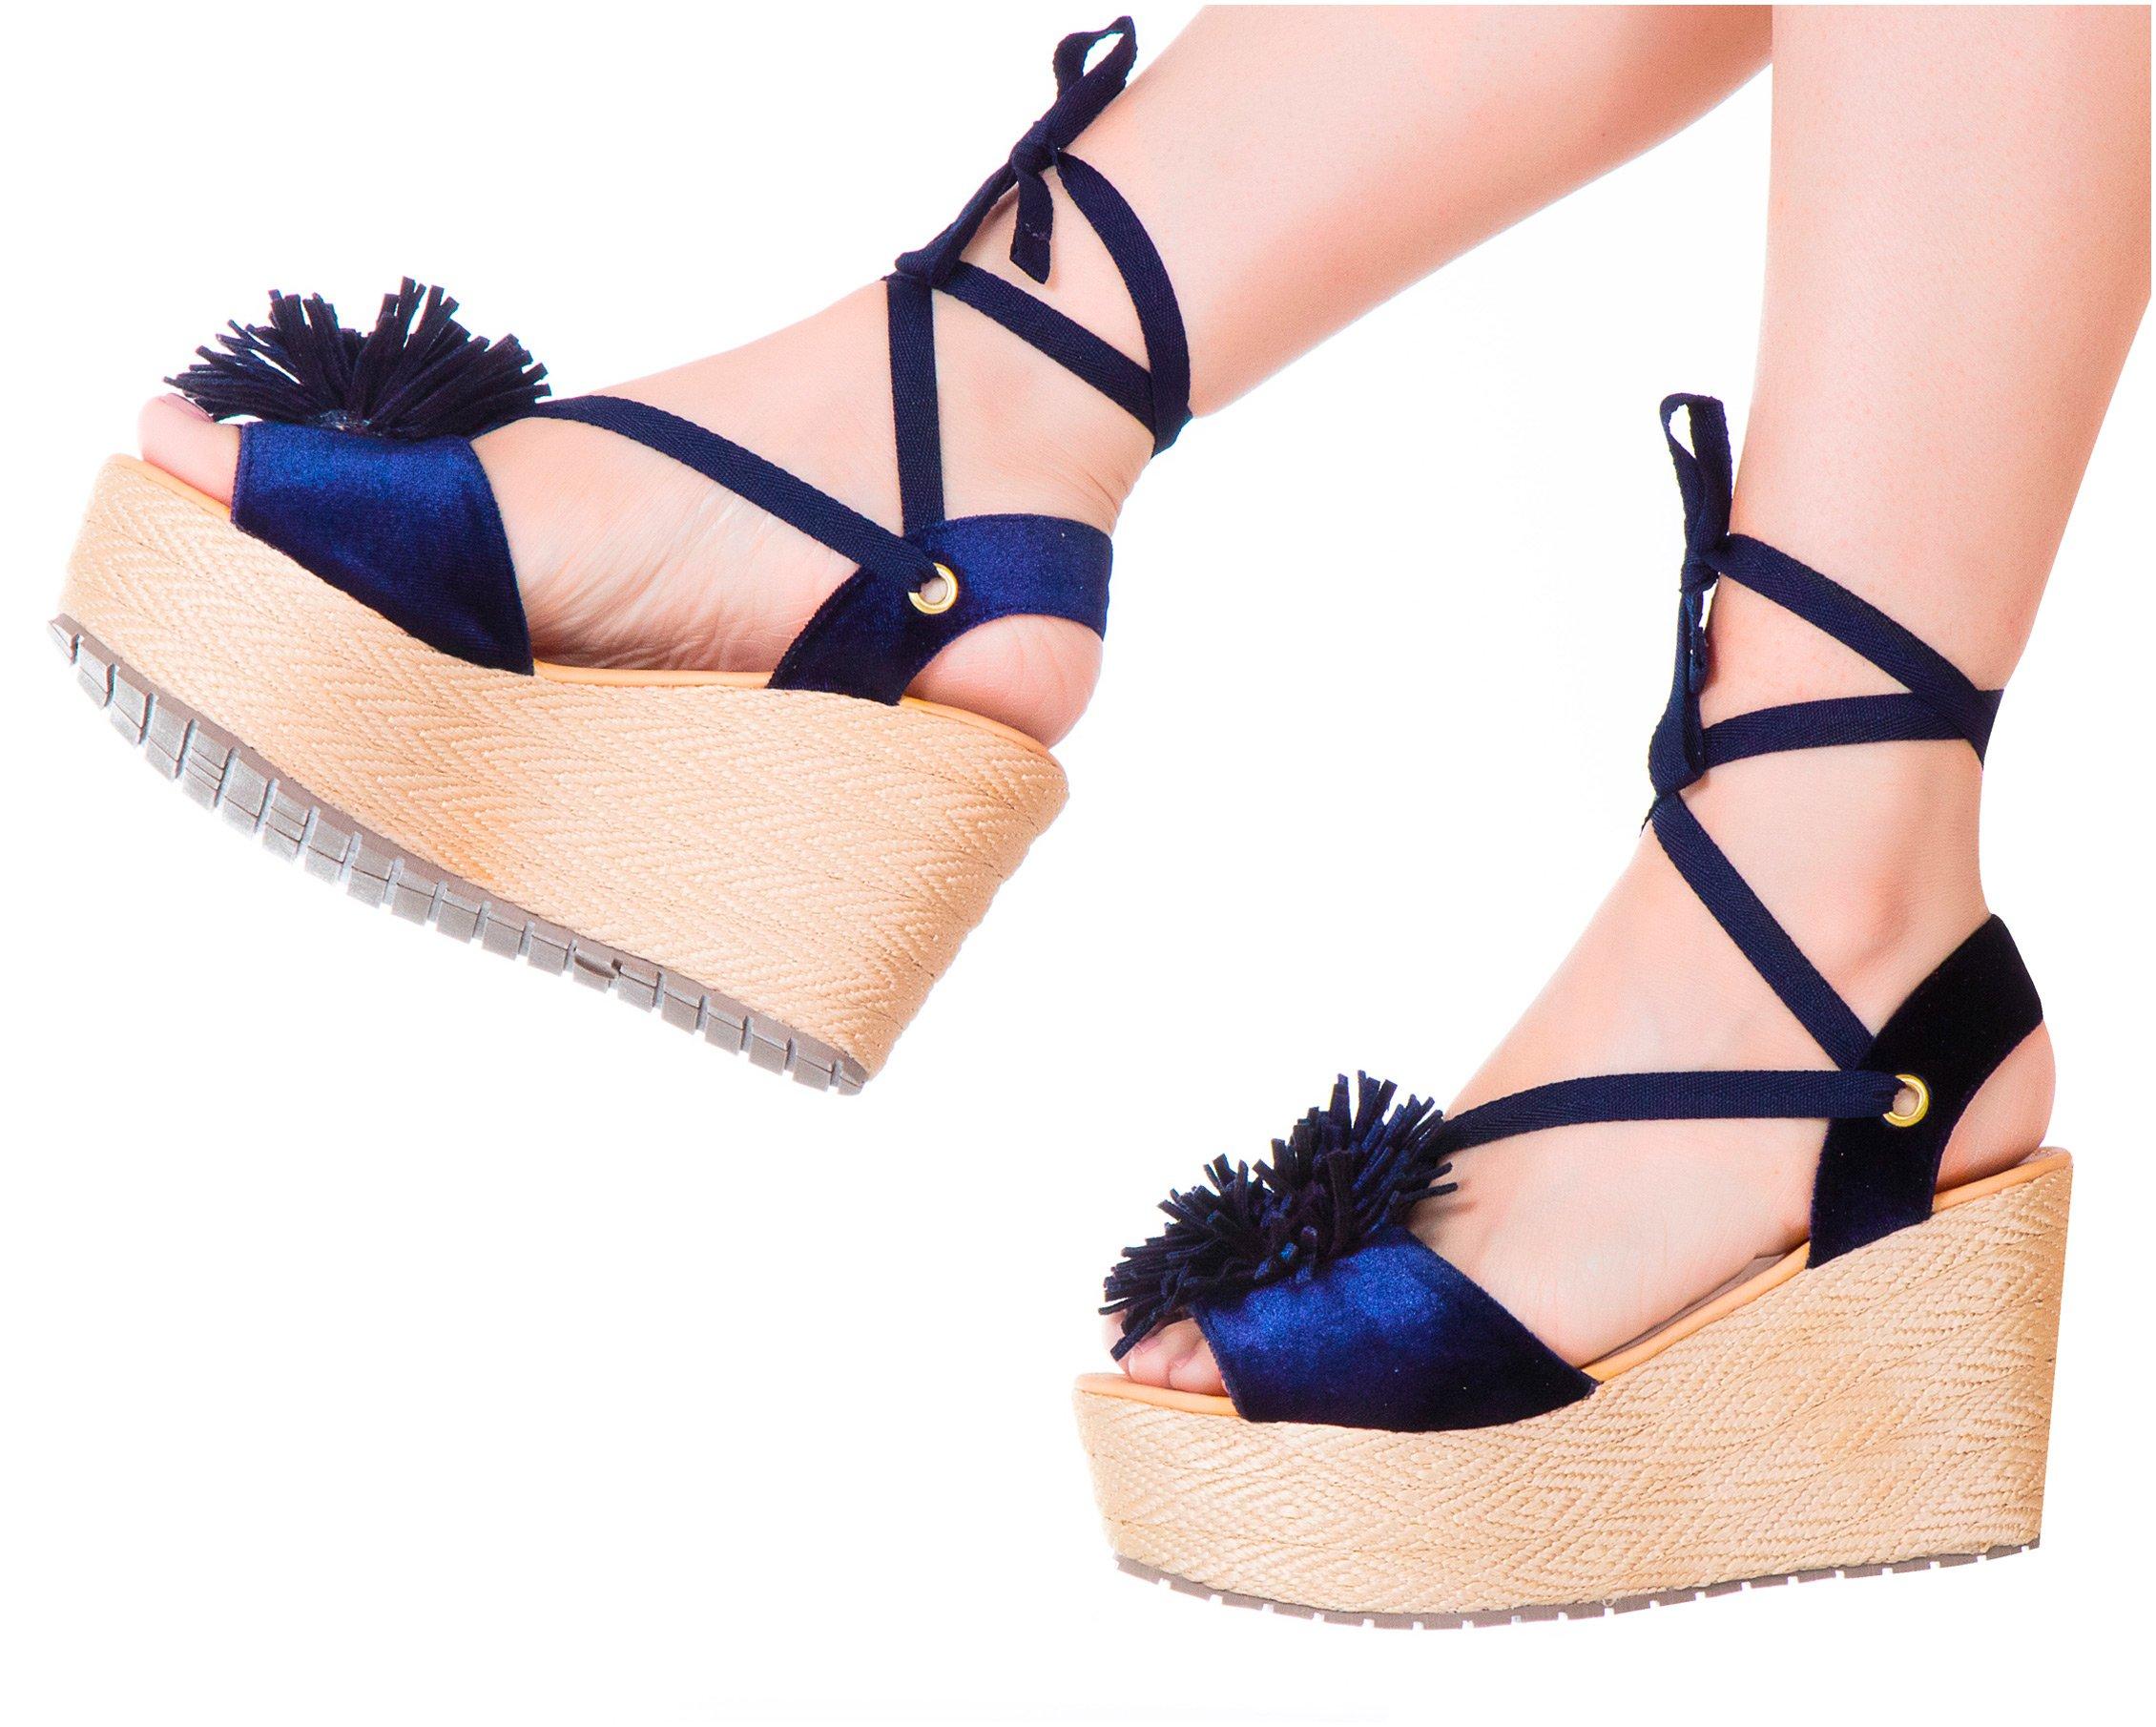 VIDALeather Women PomPom High Rise Lace up Ankle Tie Platform Colored Espadrille Comfort Fashion Shoes Calzado Plataforma de Dama de Moda Blue 5